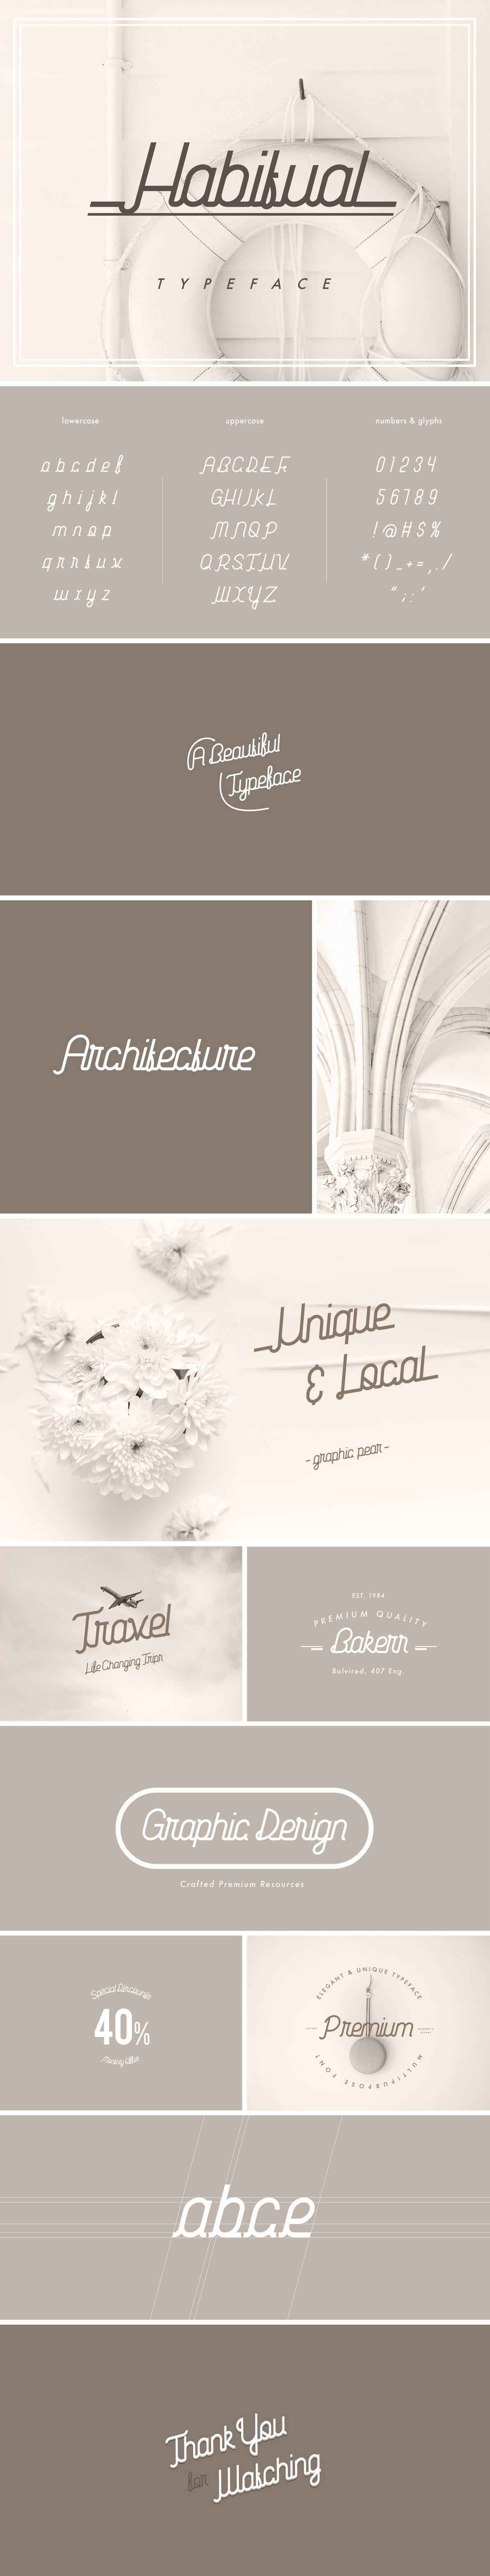 Habitual Digital Handwriting Typeface